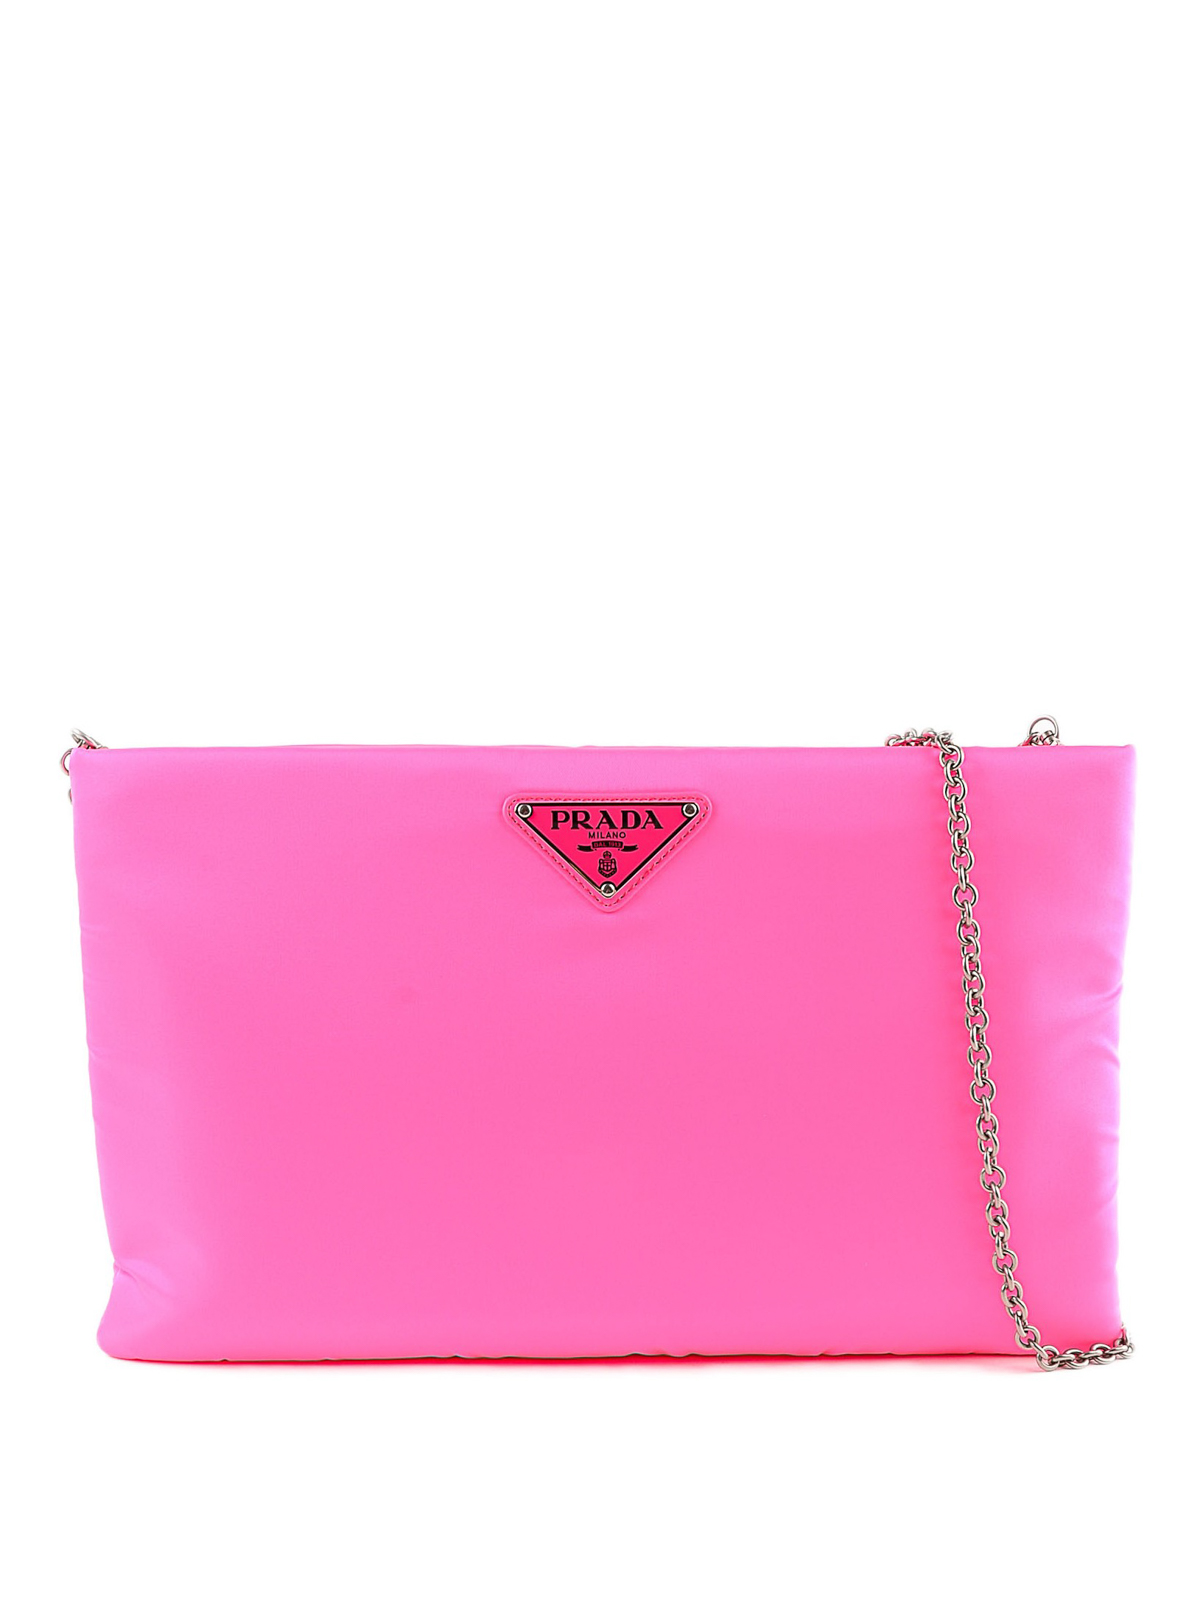 2c932d40f63d Prada - Pink medium quilted clutch - clutches - 1BF0812CCJF90 ...